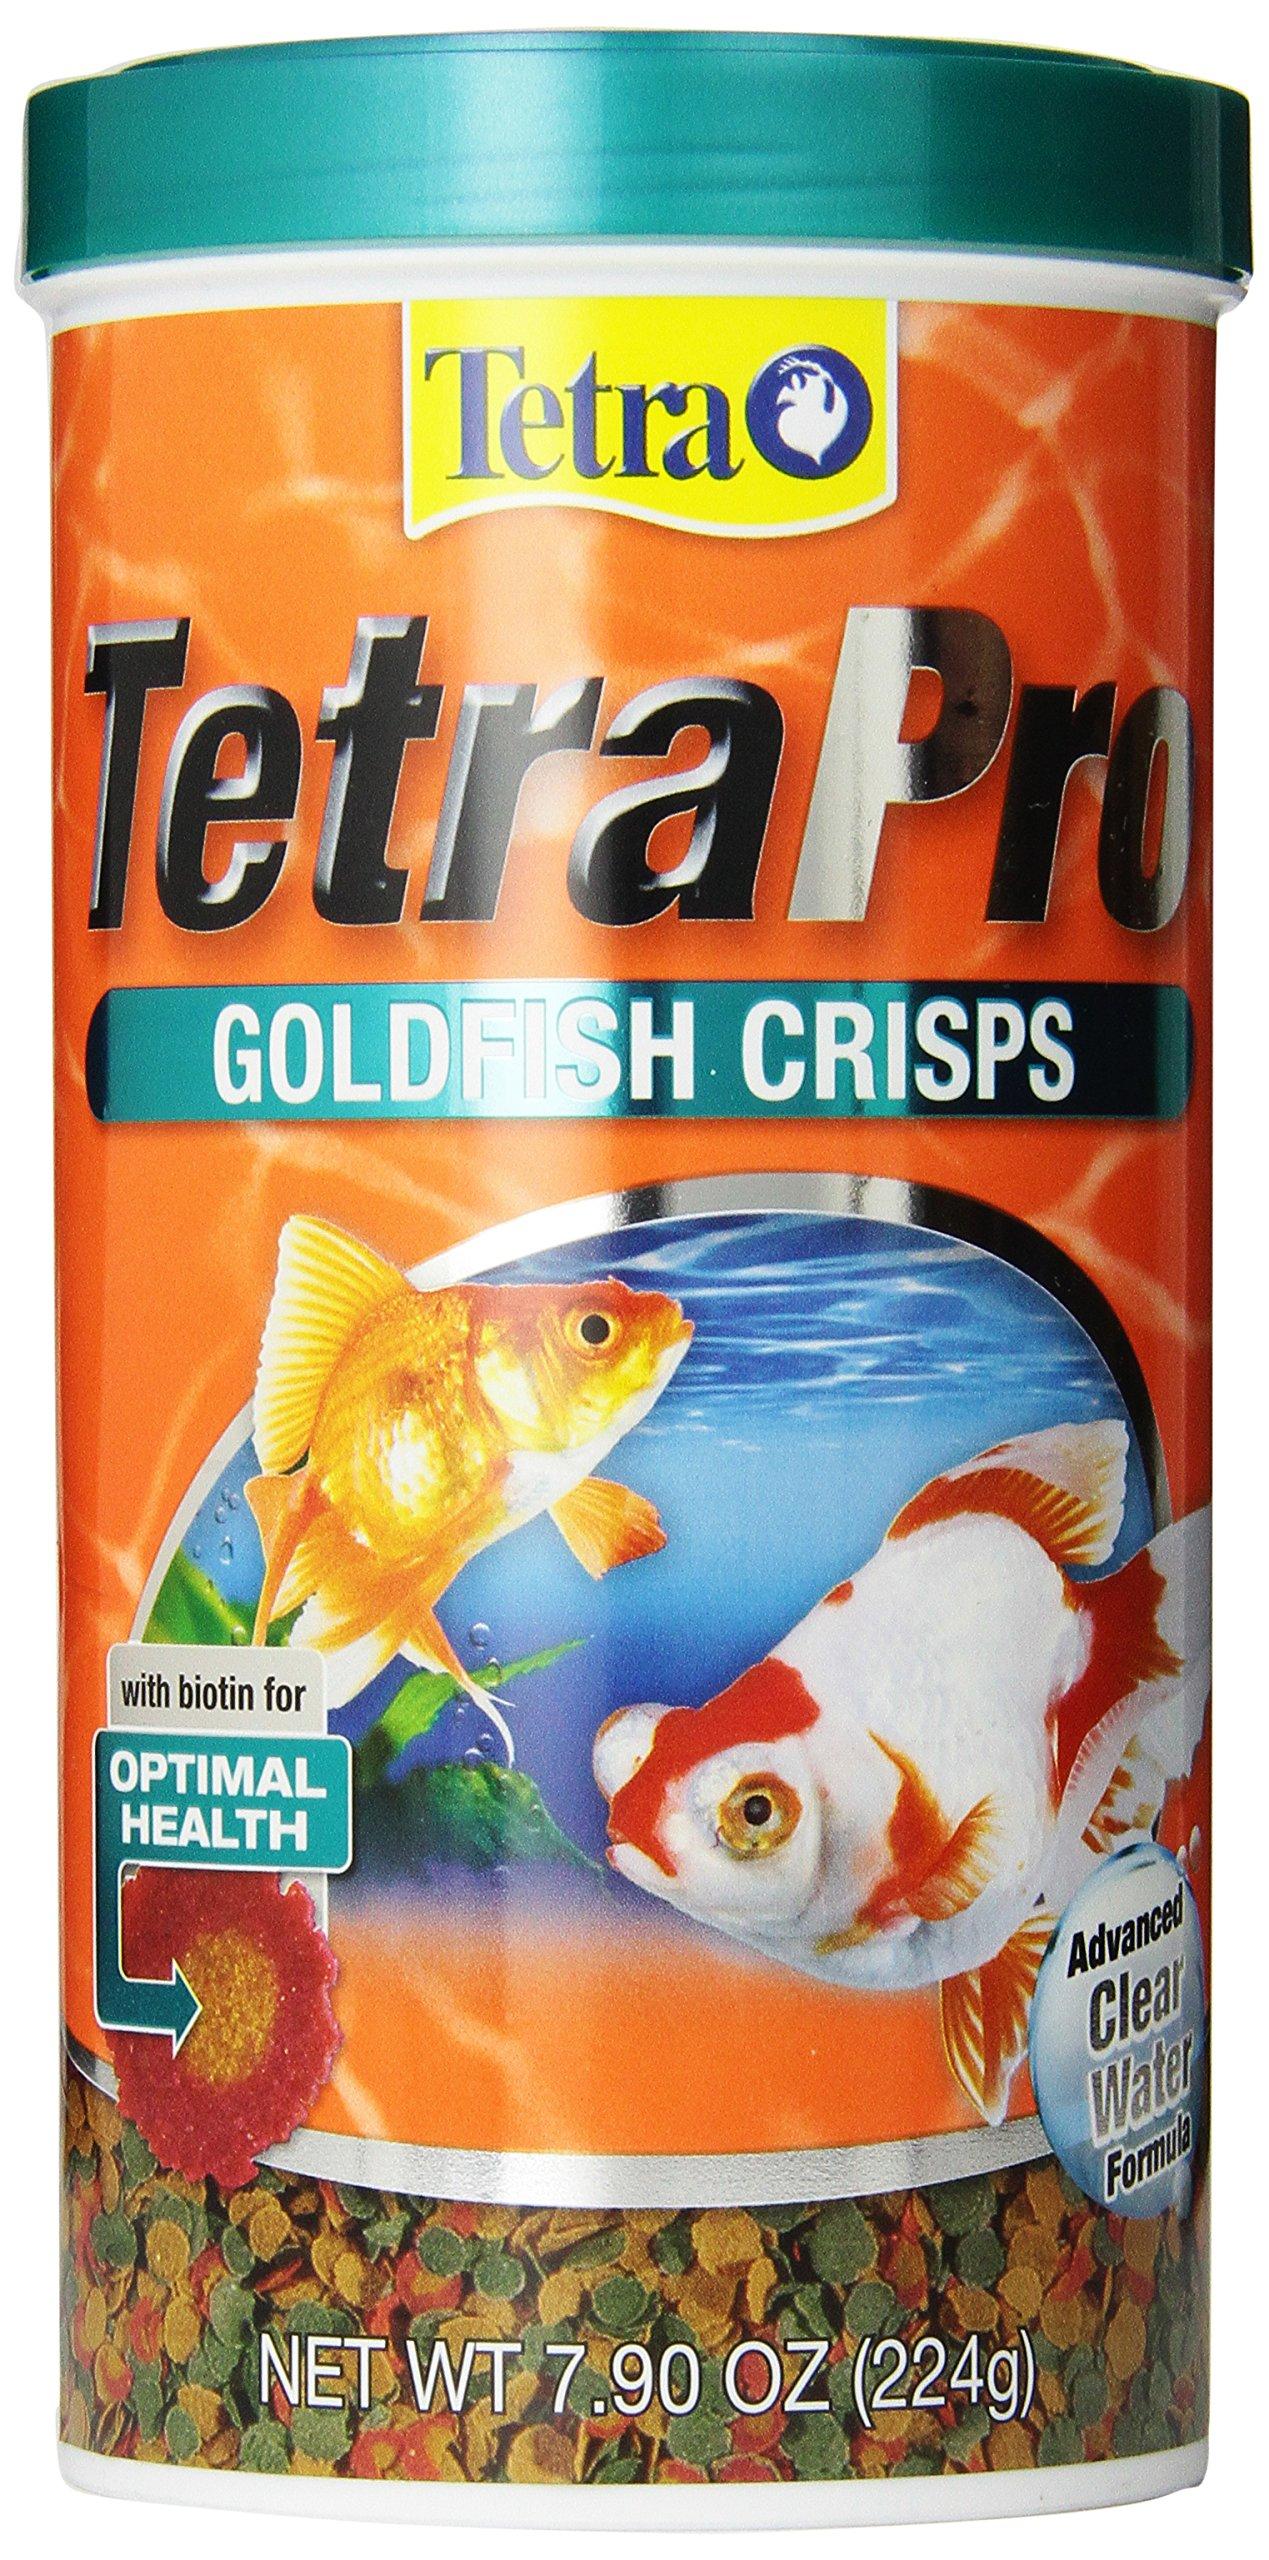 Tetra 77077 TetraPRO Goldfish Crisps for Fishes, 7.9 Ounce by Tetra